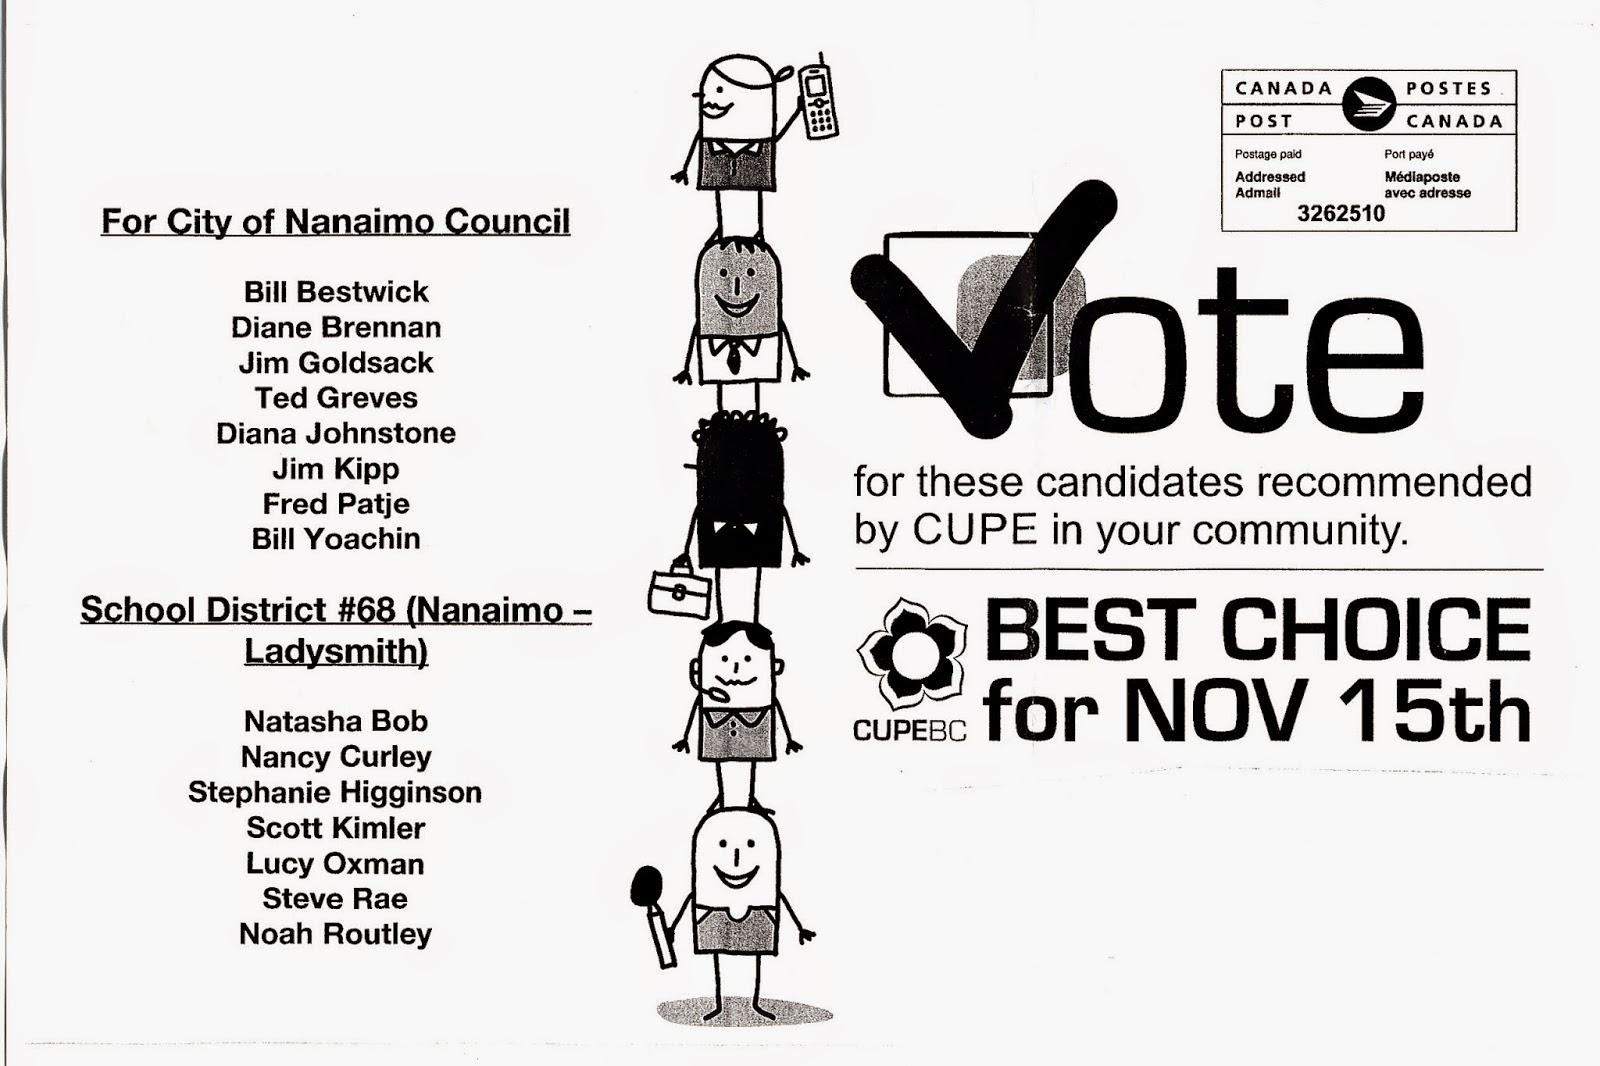 Nanaimo-Info-blog: DO UNIONS INFLUENCE ELECTIONS?